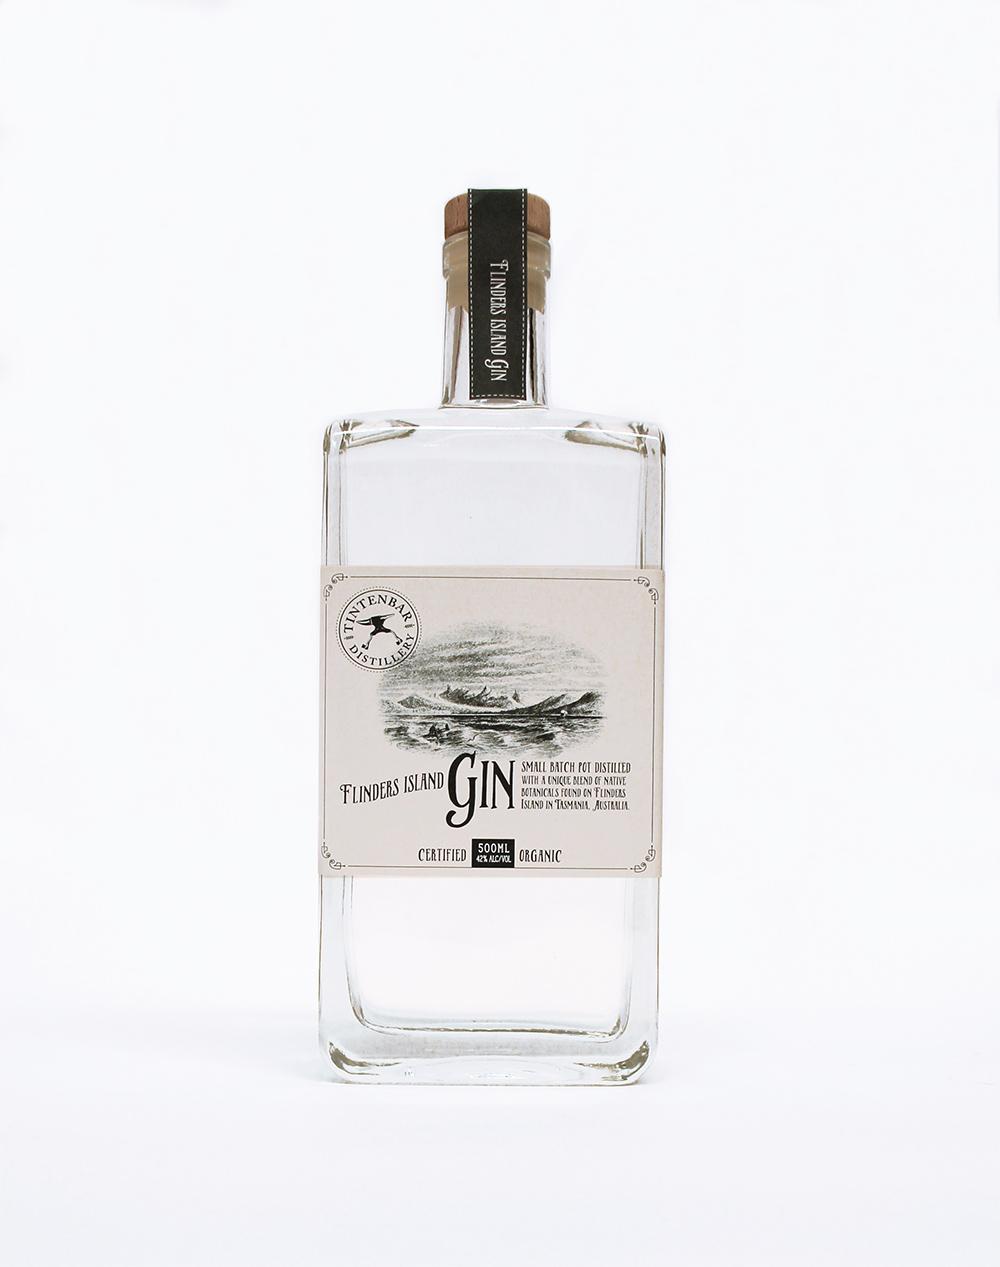 Flinders Island Gin 500ml product photo